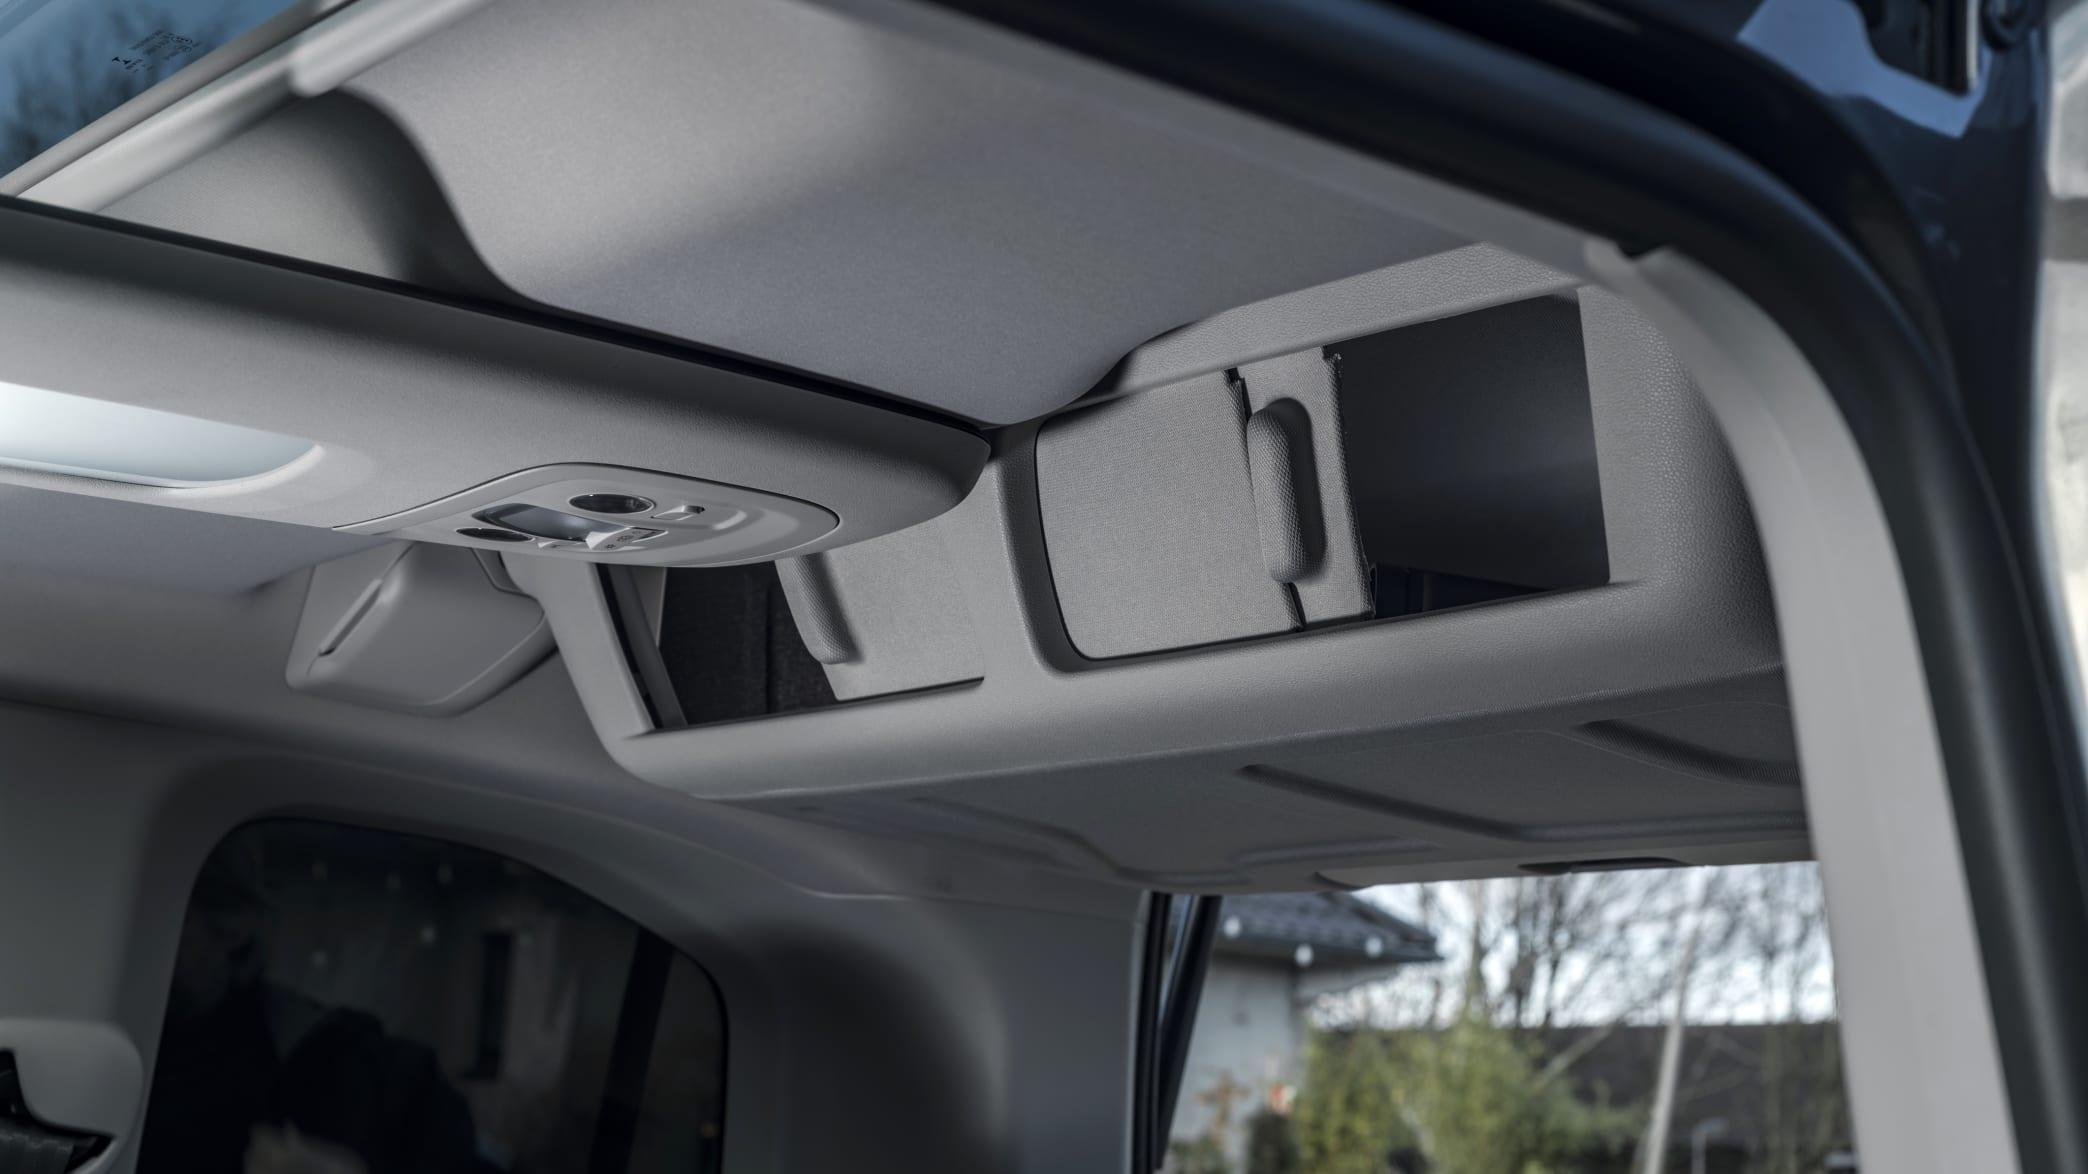 Innenraumdetails des Toyota ProAce City